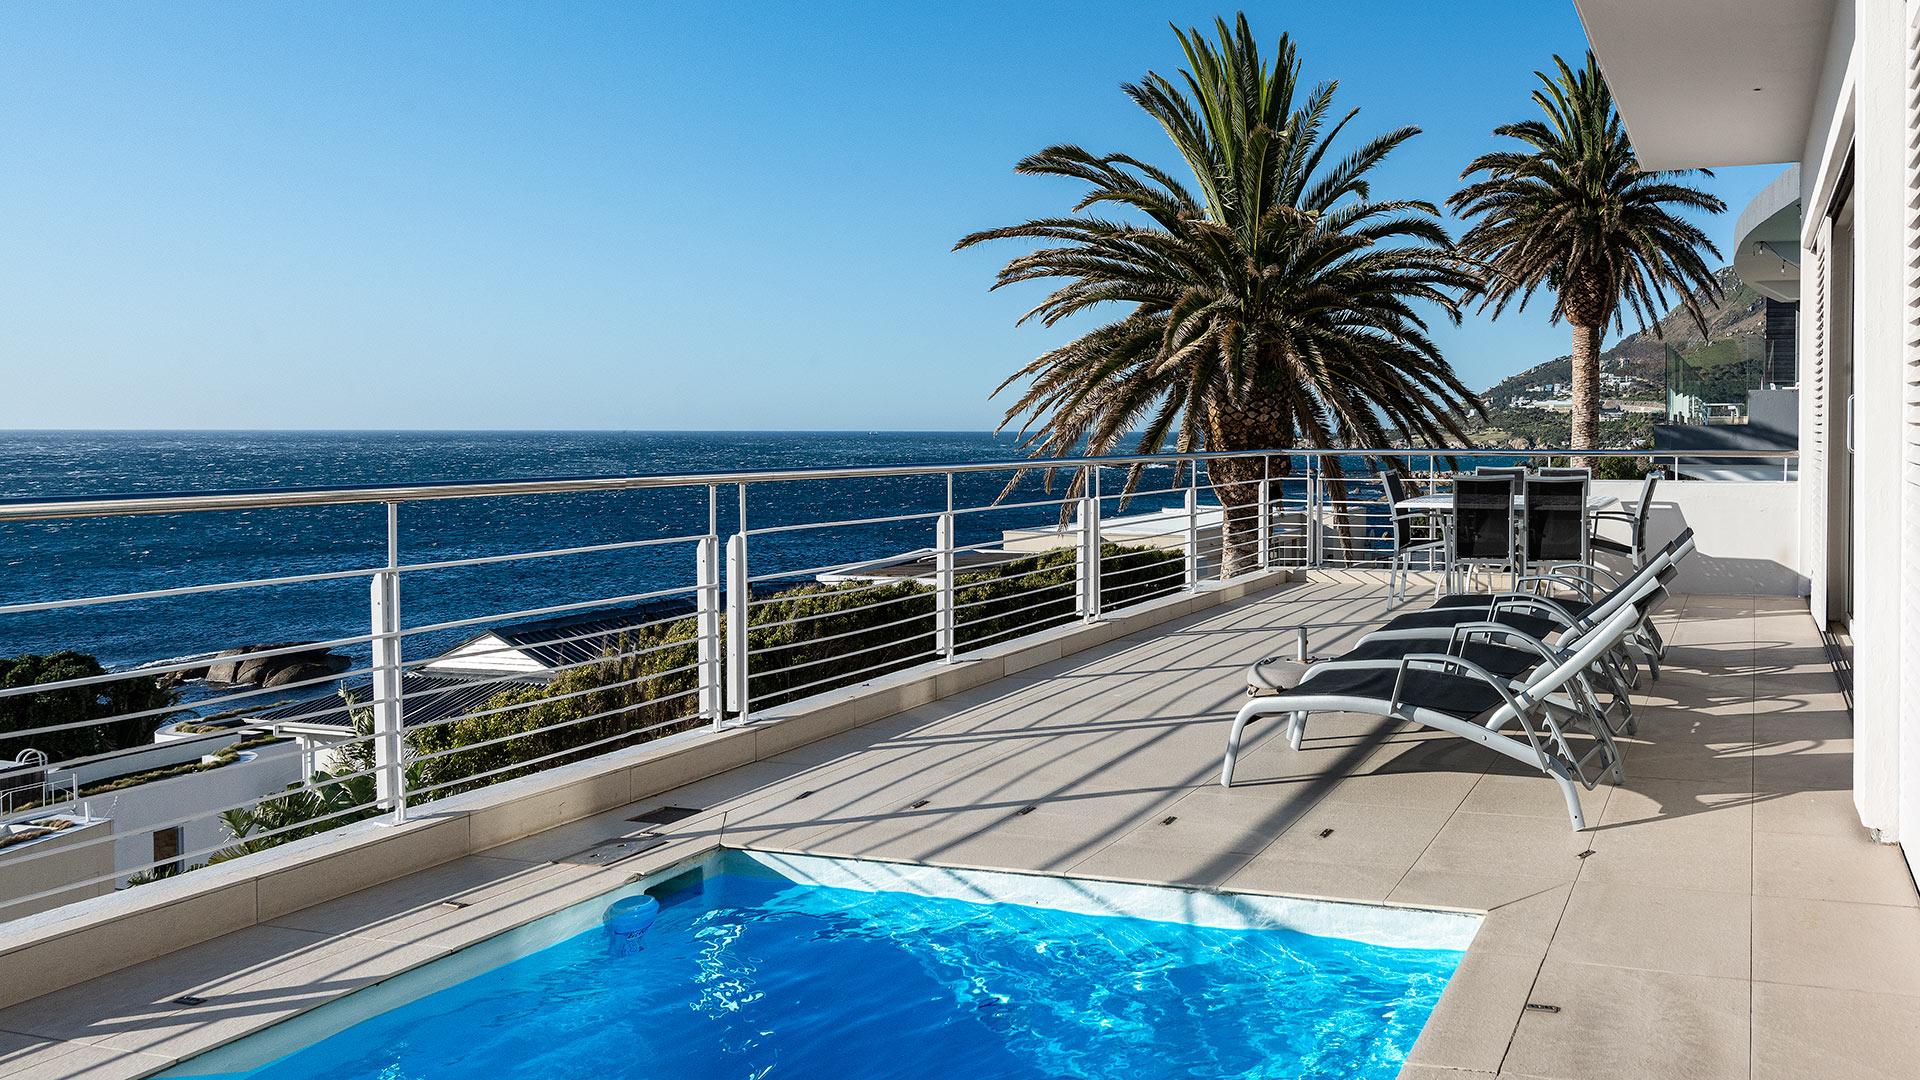 blue-views-luxury-villa-penthouse-accommodation-camps-bay-4